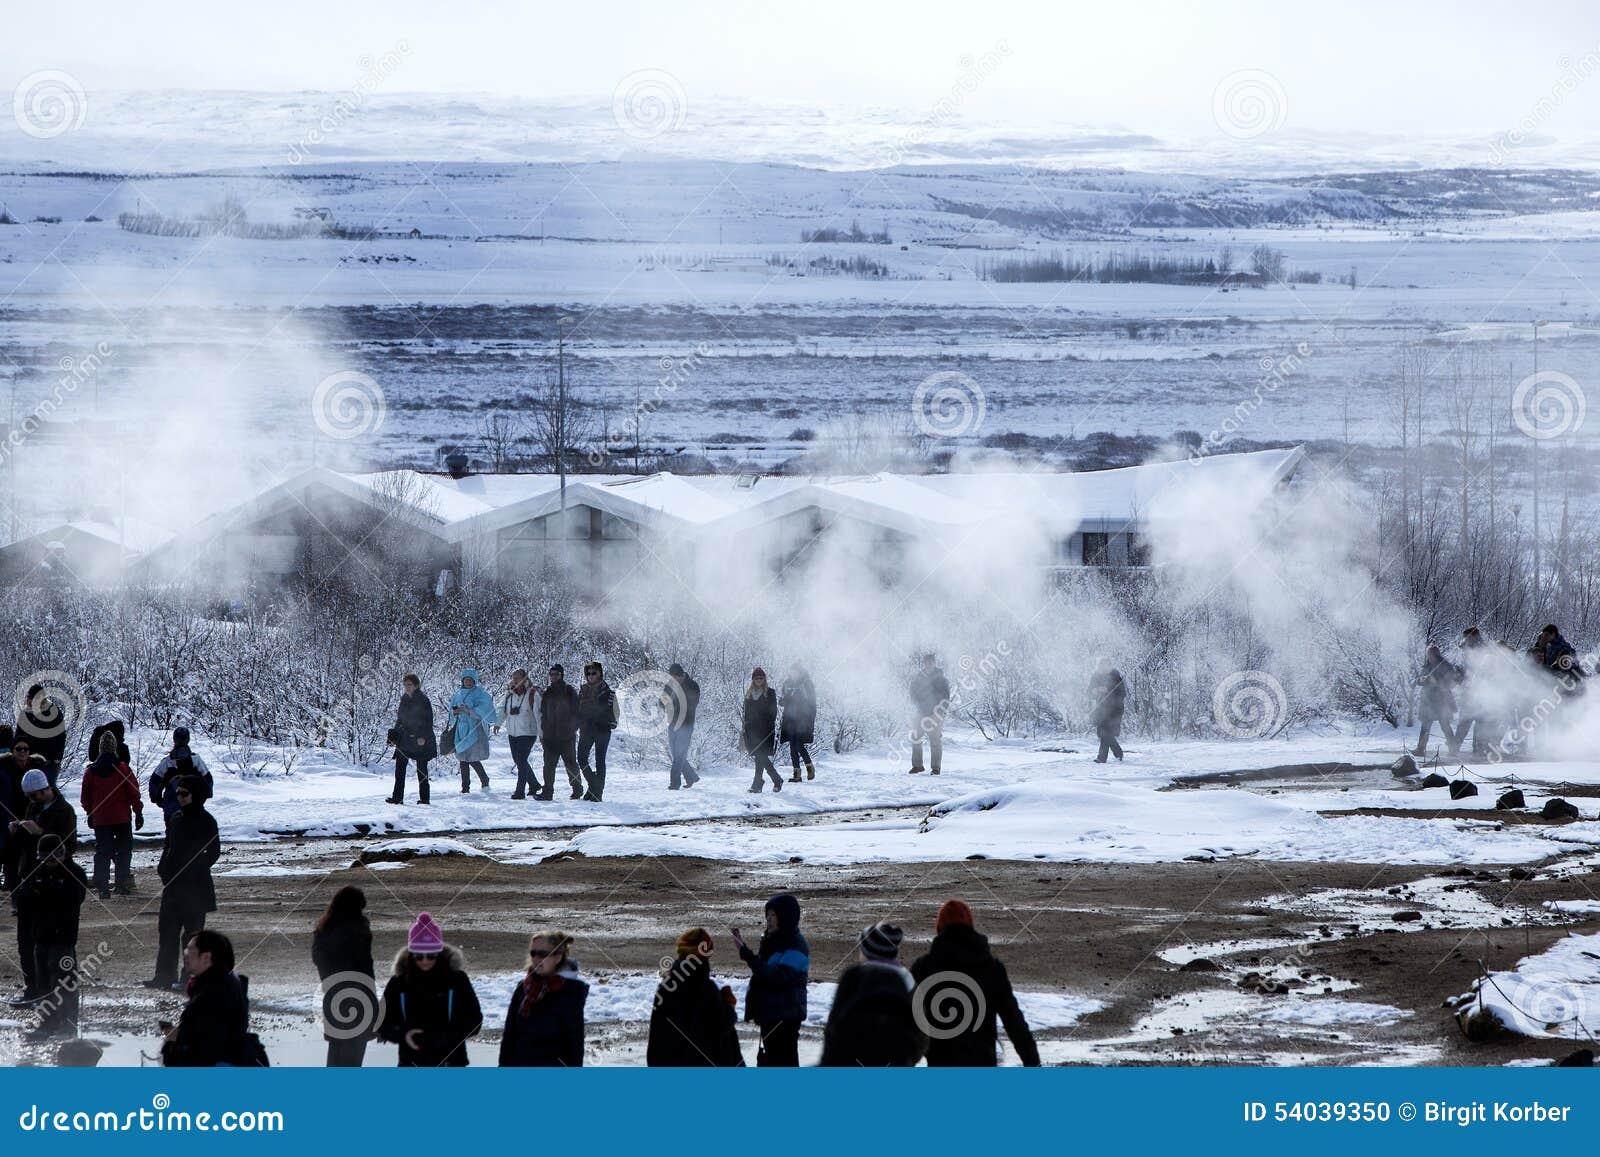 Plz I;d watching the geyser girls